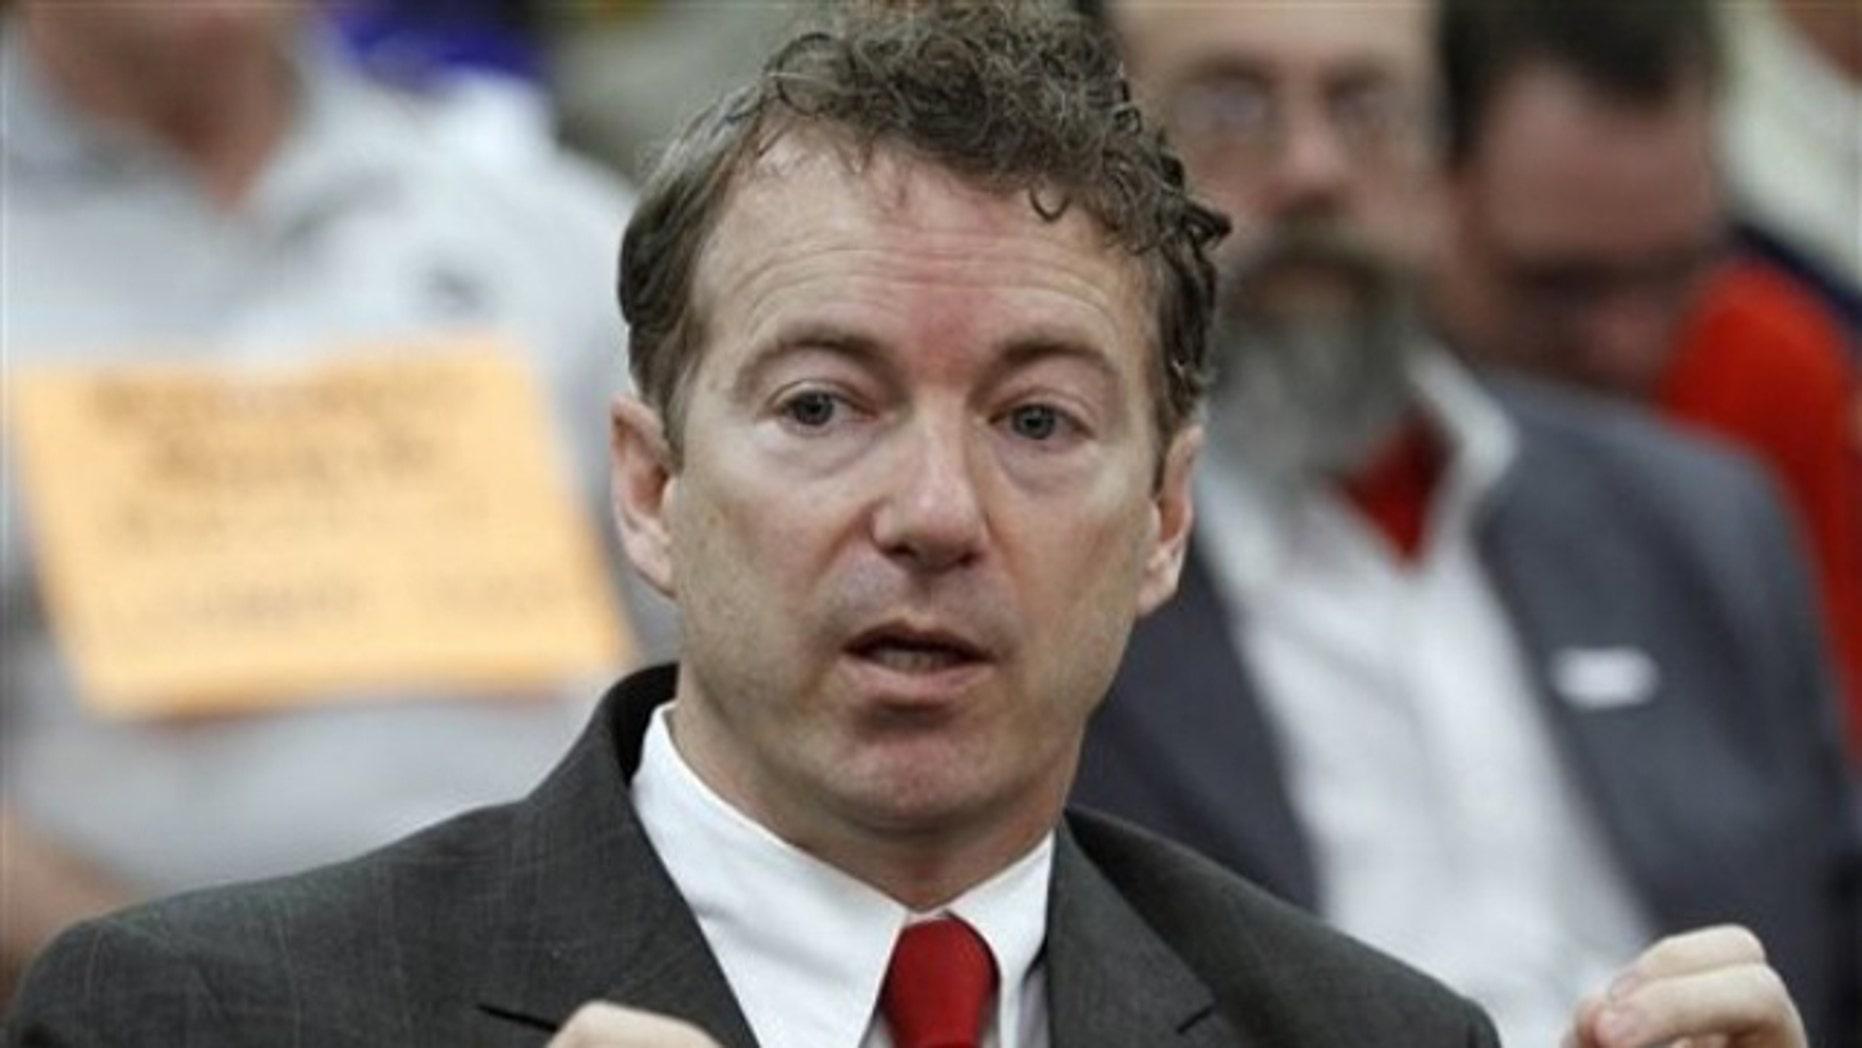 Sen. Rand Paul speaks to a crowd in a Kentucky Senate committee room in Frankfort, Ky., on Feb. 22.